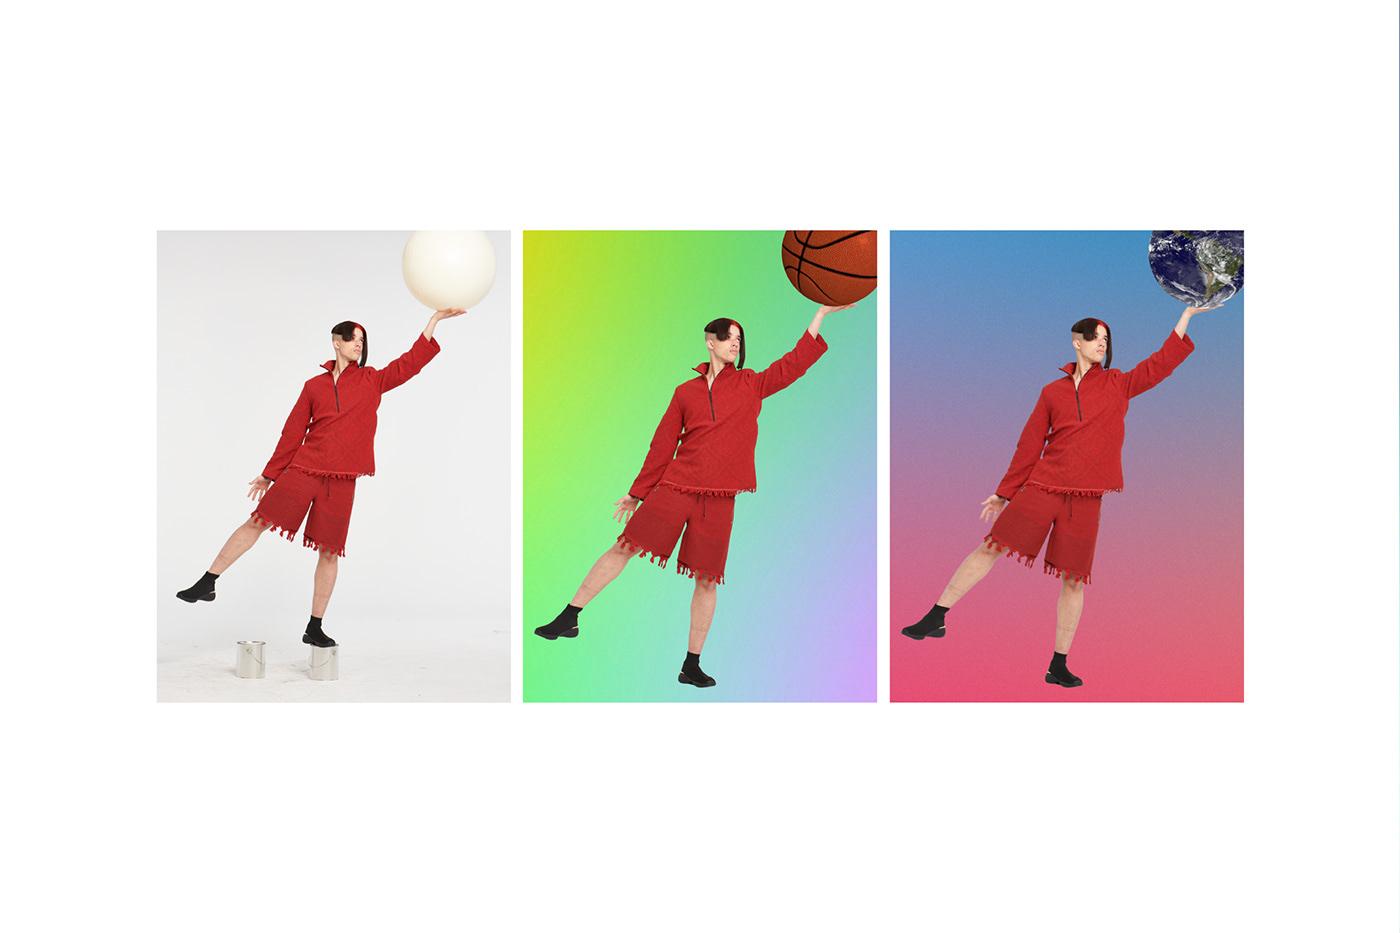 art direction  branding  design Fashion  graphic design  logo Photography  PicsArt Rebrand The New Company